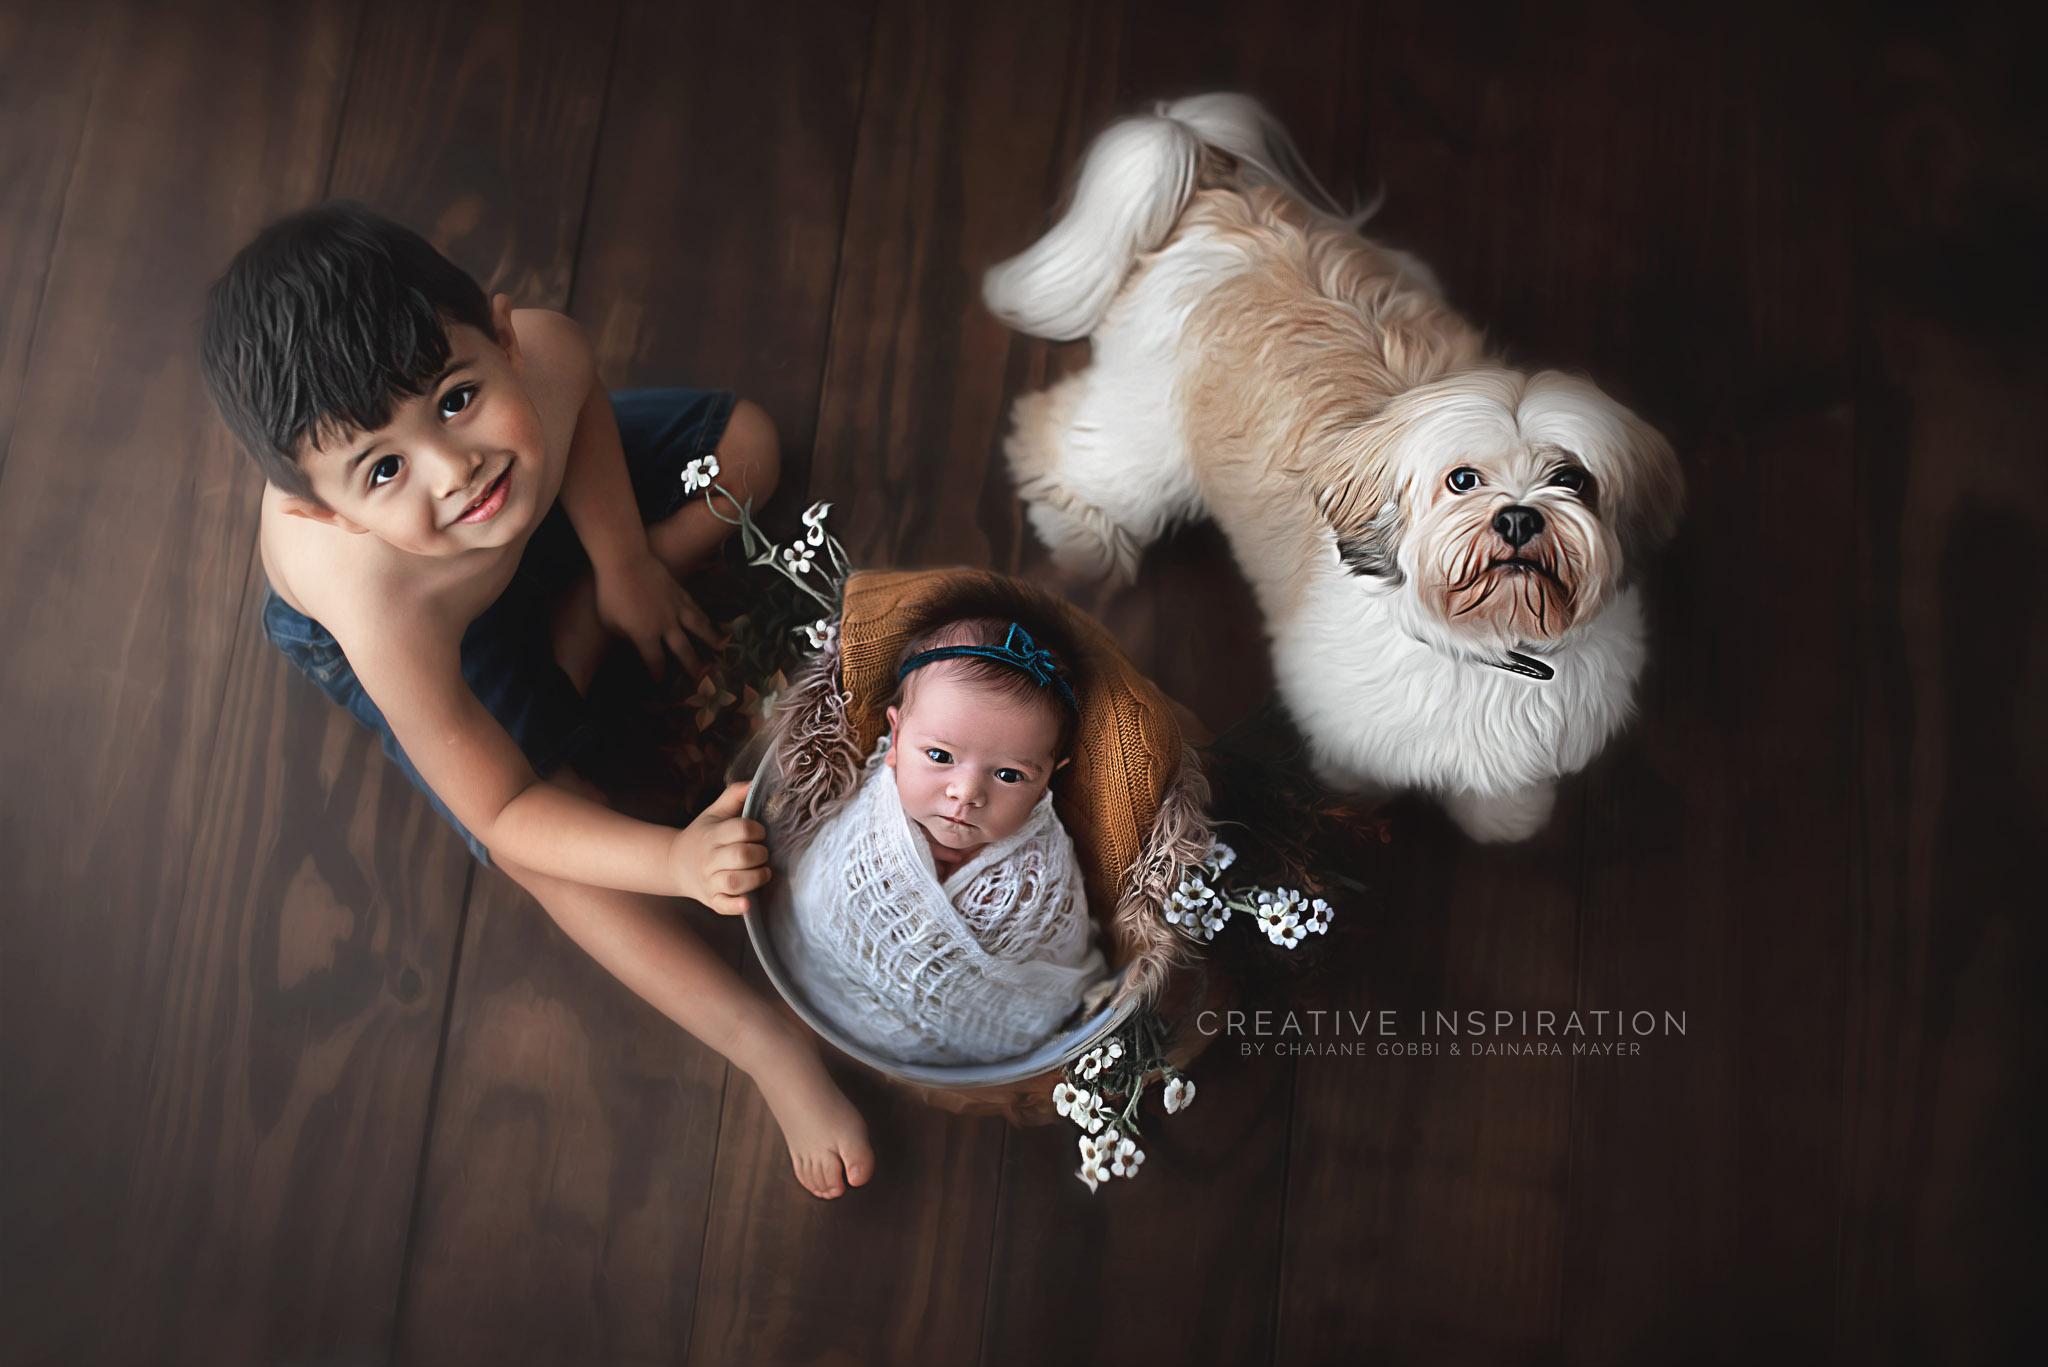 Contate Creative Inspiration Photography